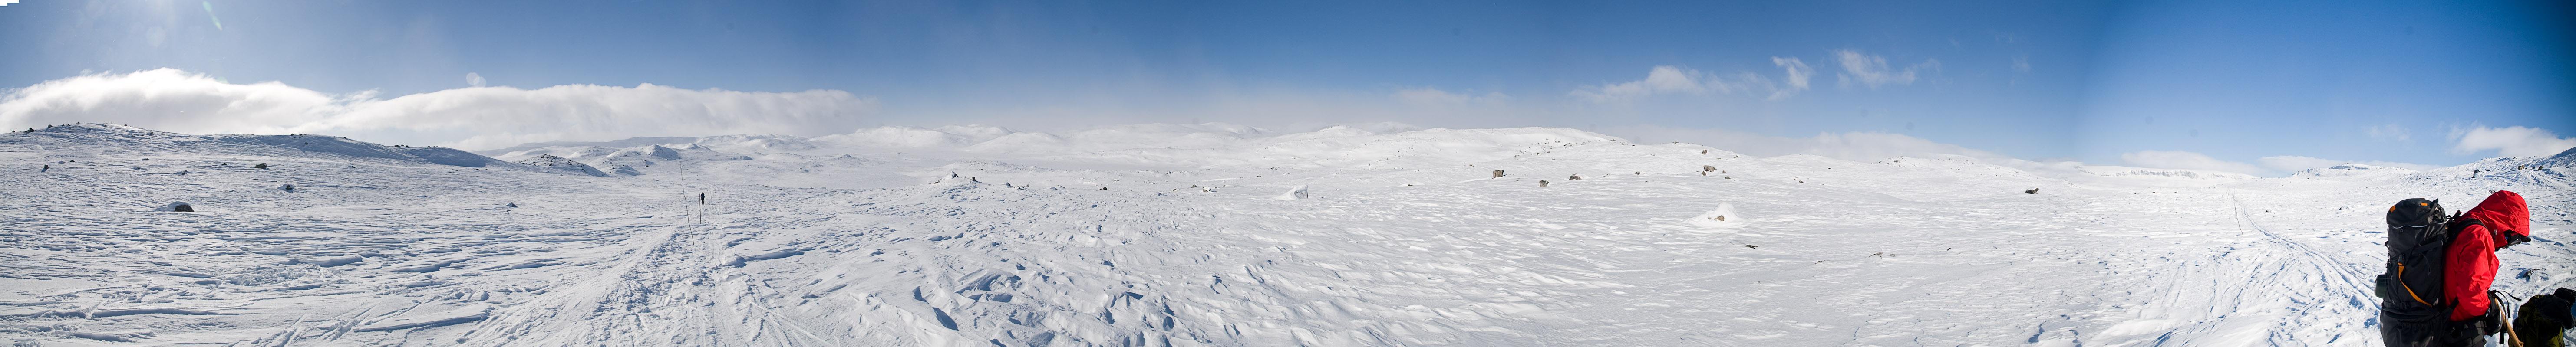 Panorama fra Hardangervidda mellom Krækkja og Haugastøl